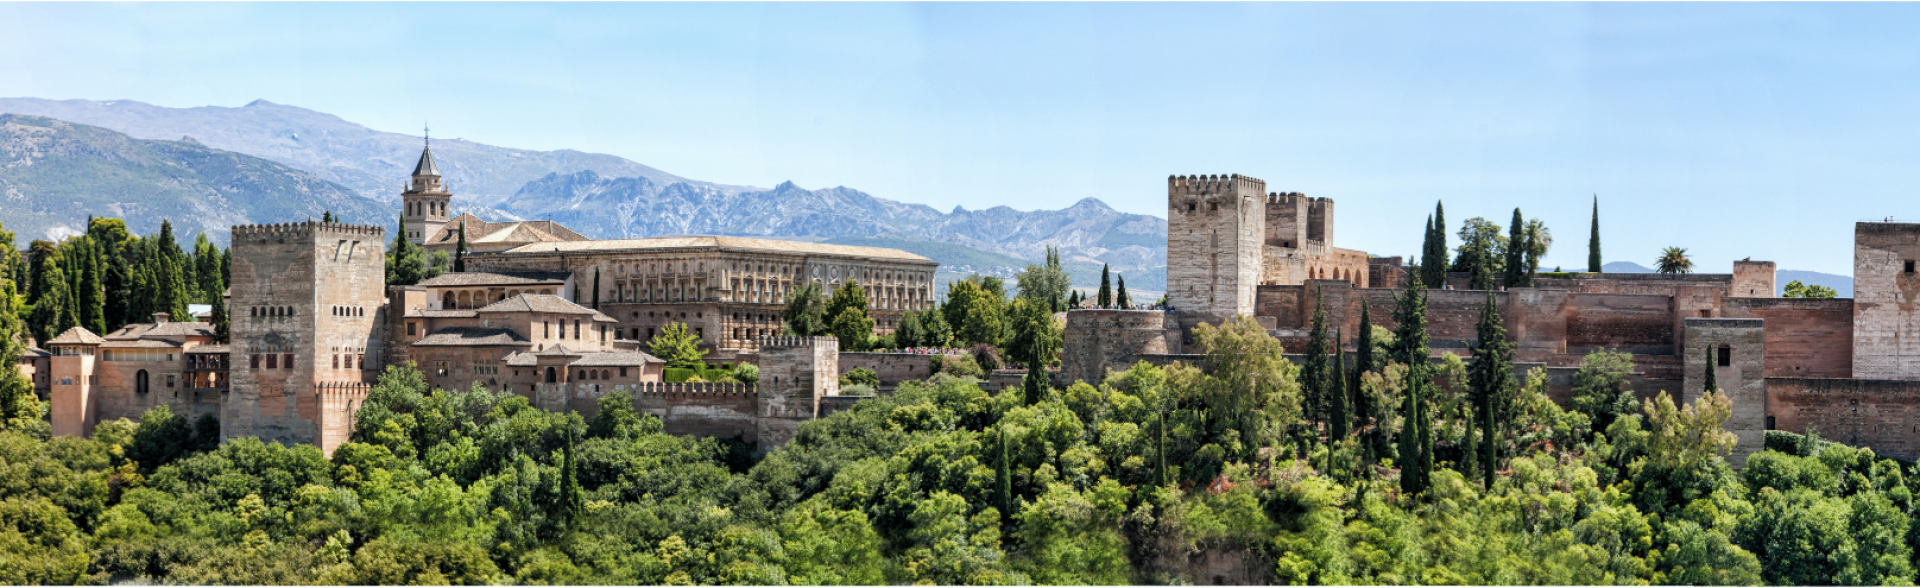 Alhambra 1920x492